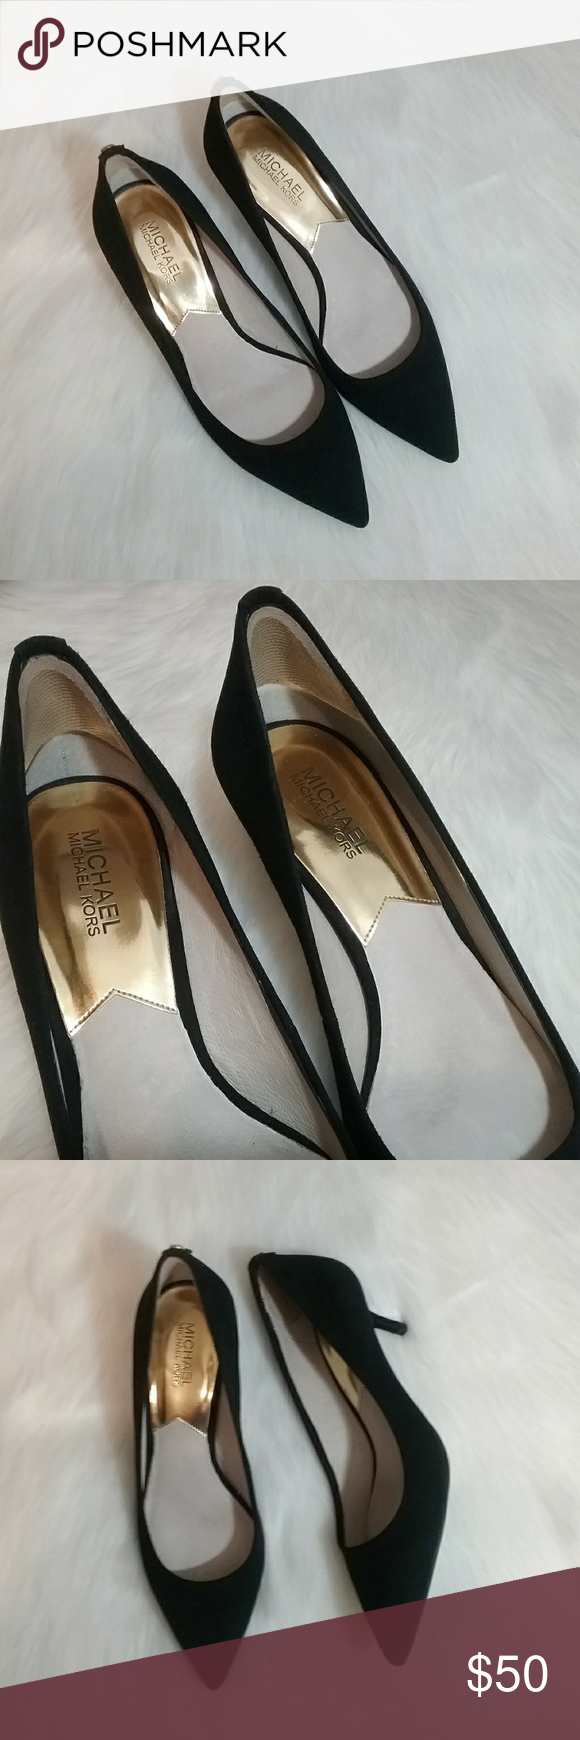 Michael Kors Black Suede Leather Kitten Heels Michael Kors Shoes Heels Kitten Heels Suede Leather